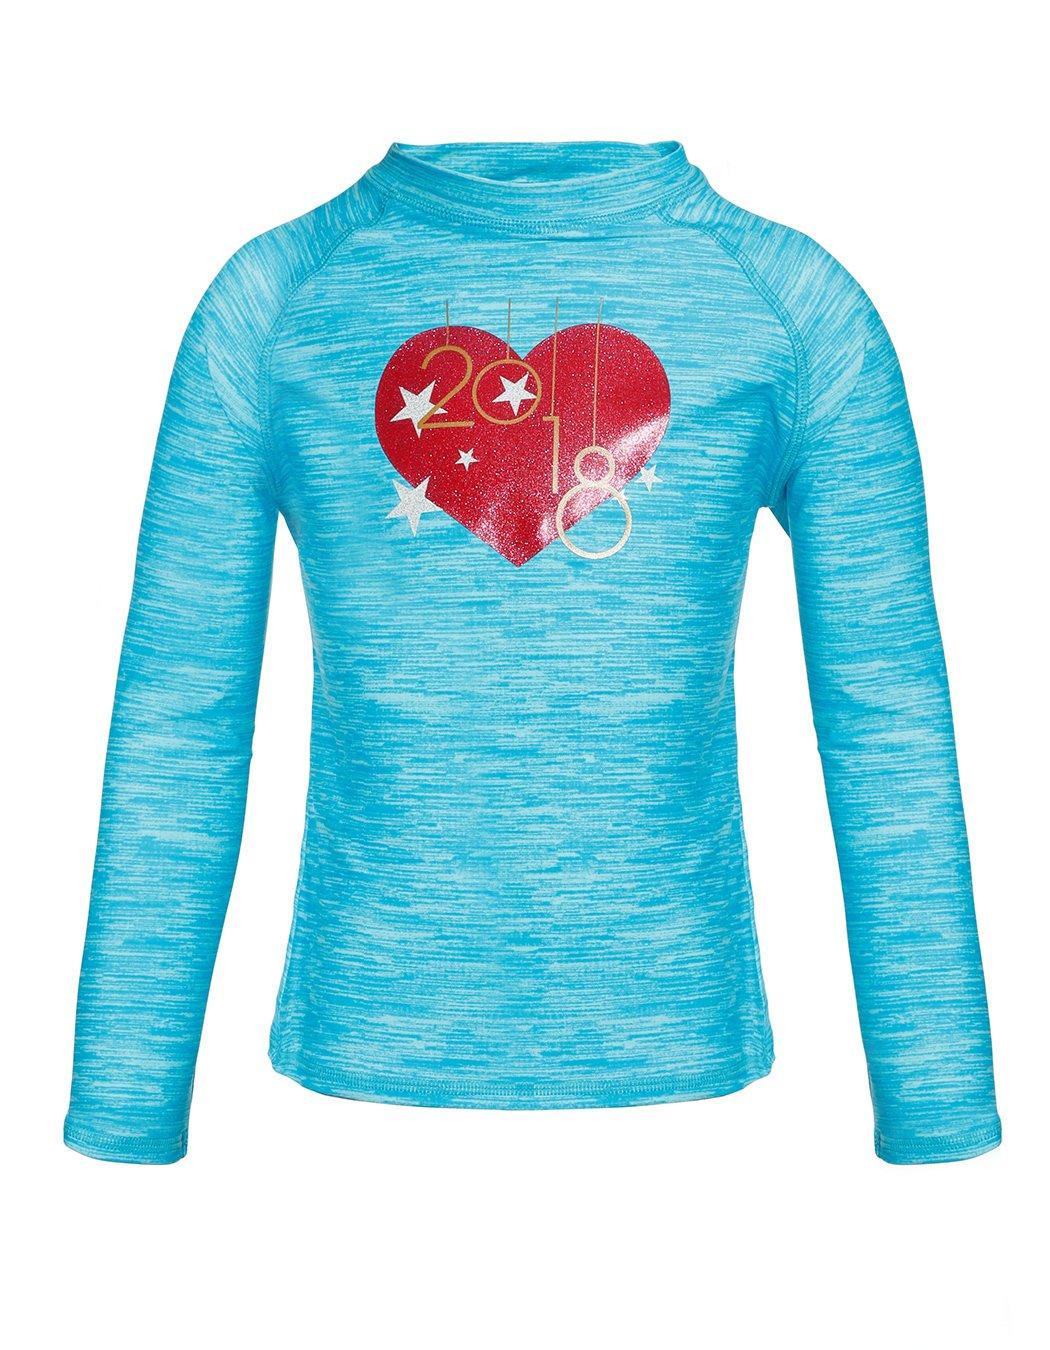 Girls Long Sleeve Rash Guard Shirt, UPF 50+ Sun Protection Swim Shirt